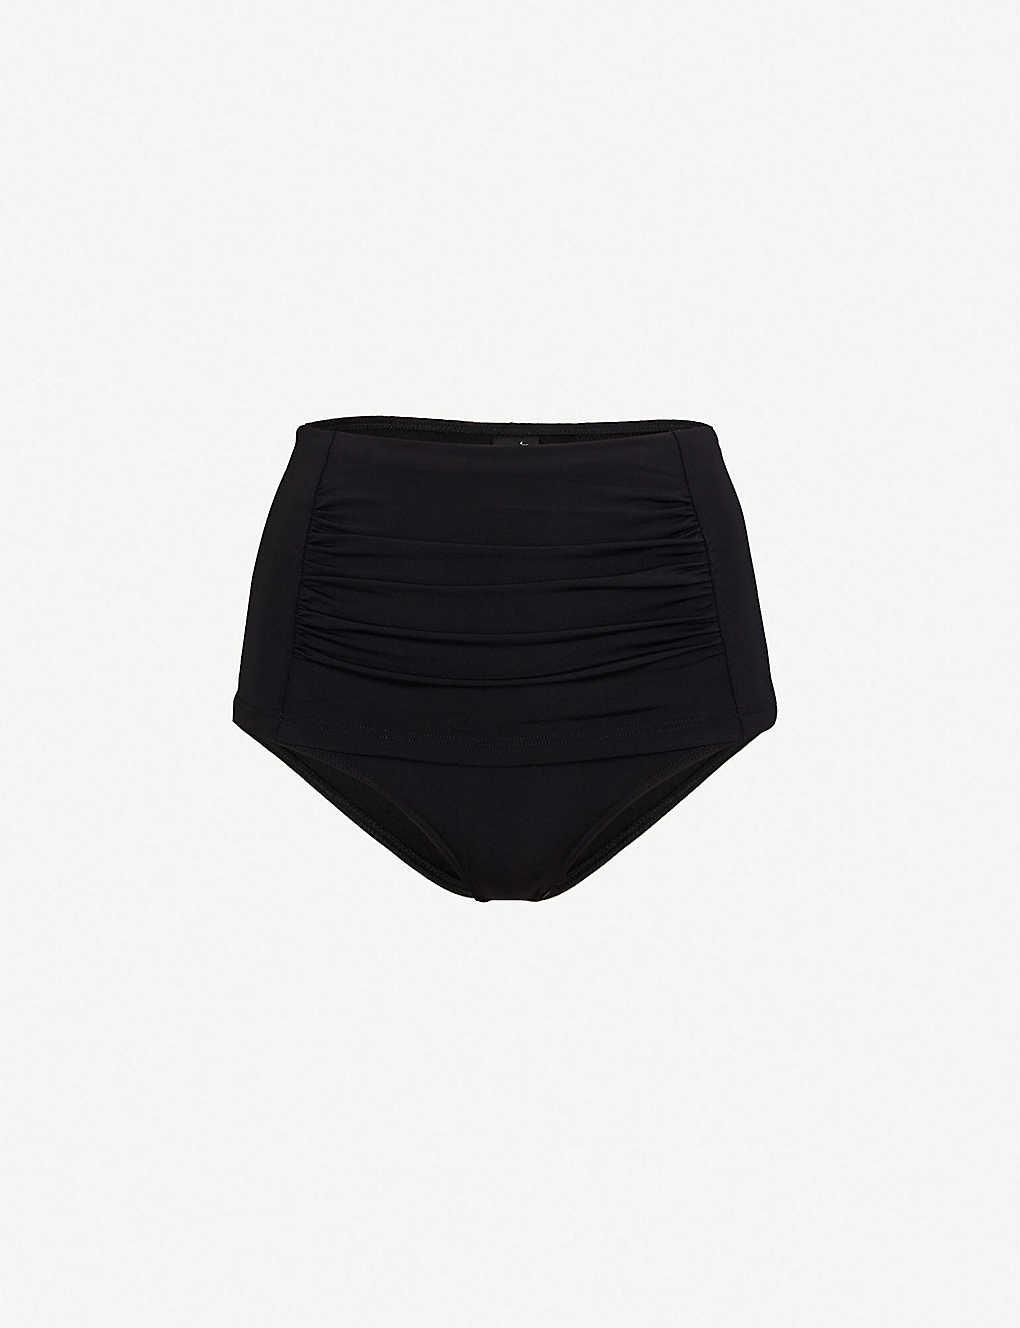 a452879a65 JETS BY JESSIKA ALLEN - Classique bikini bottoms